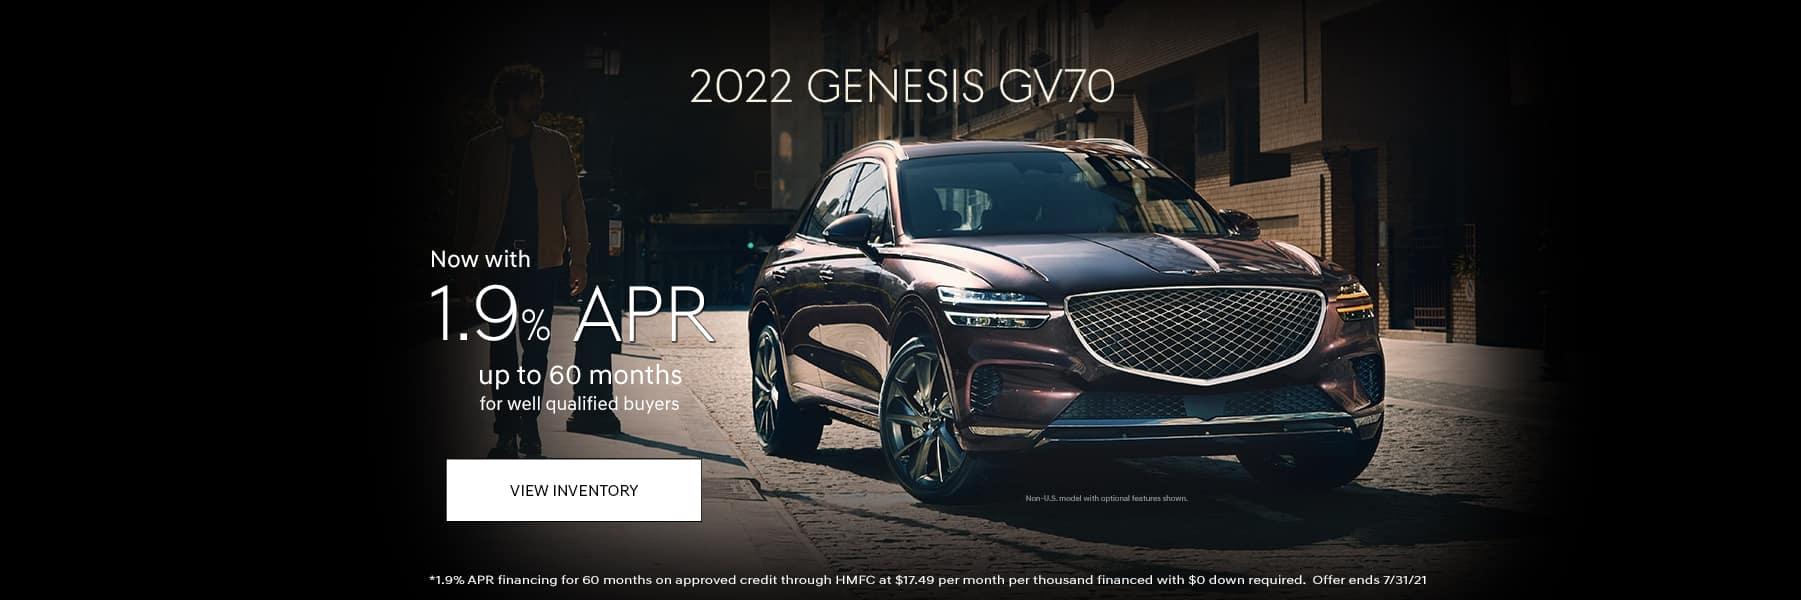 2022-Genesis-GV70-Jul21